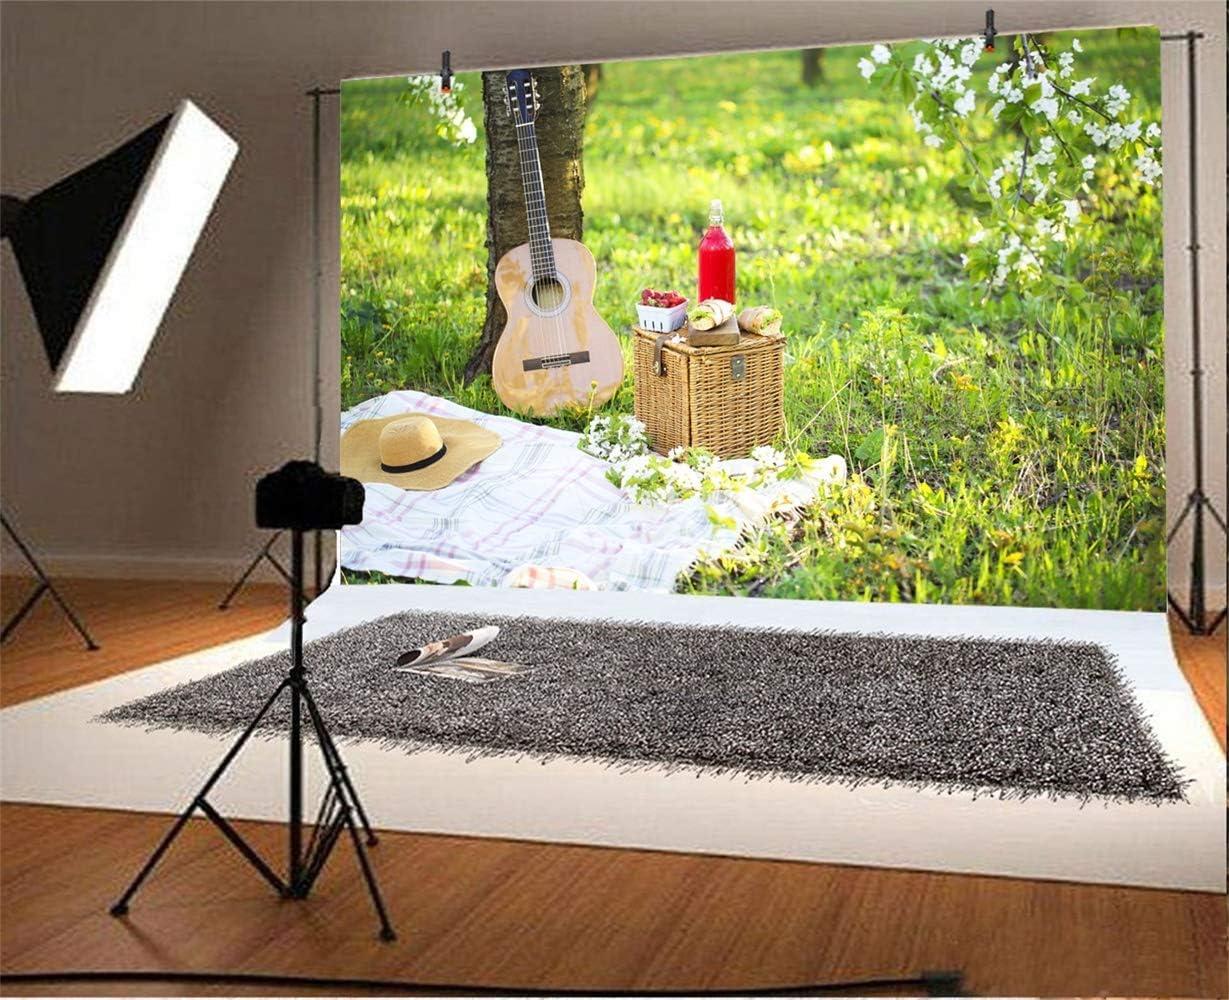 7x5ft Gardon Picnic Background Polyester Spring Scenic Photograpghy Backdrop Guiter Basket Sandwiches Juice Straw Hat White Flowers Green Grassland Wedding Photo Studio Personal Portraits